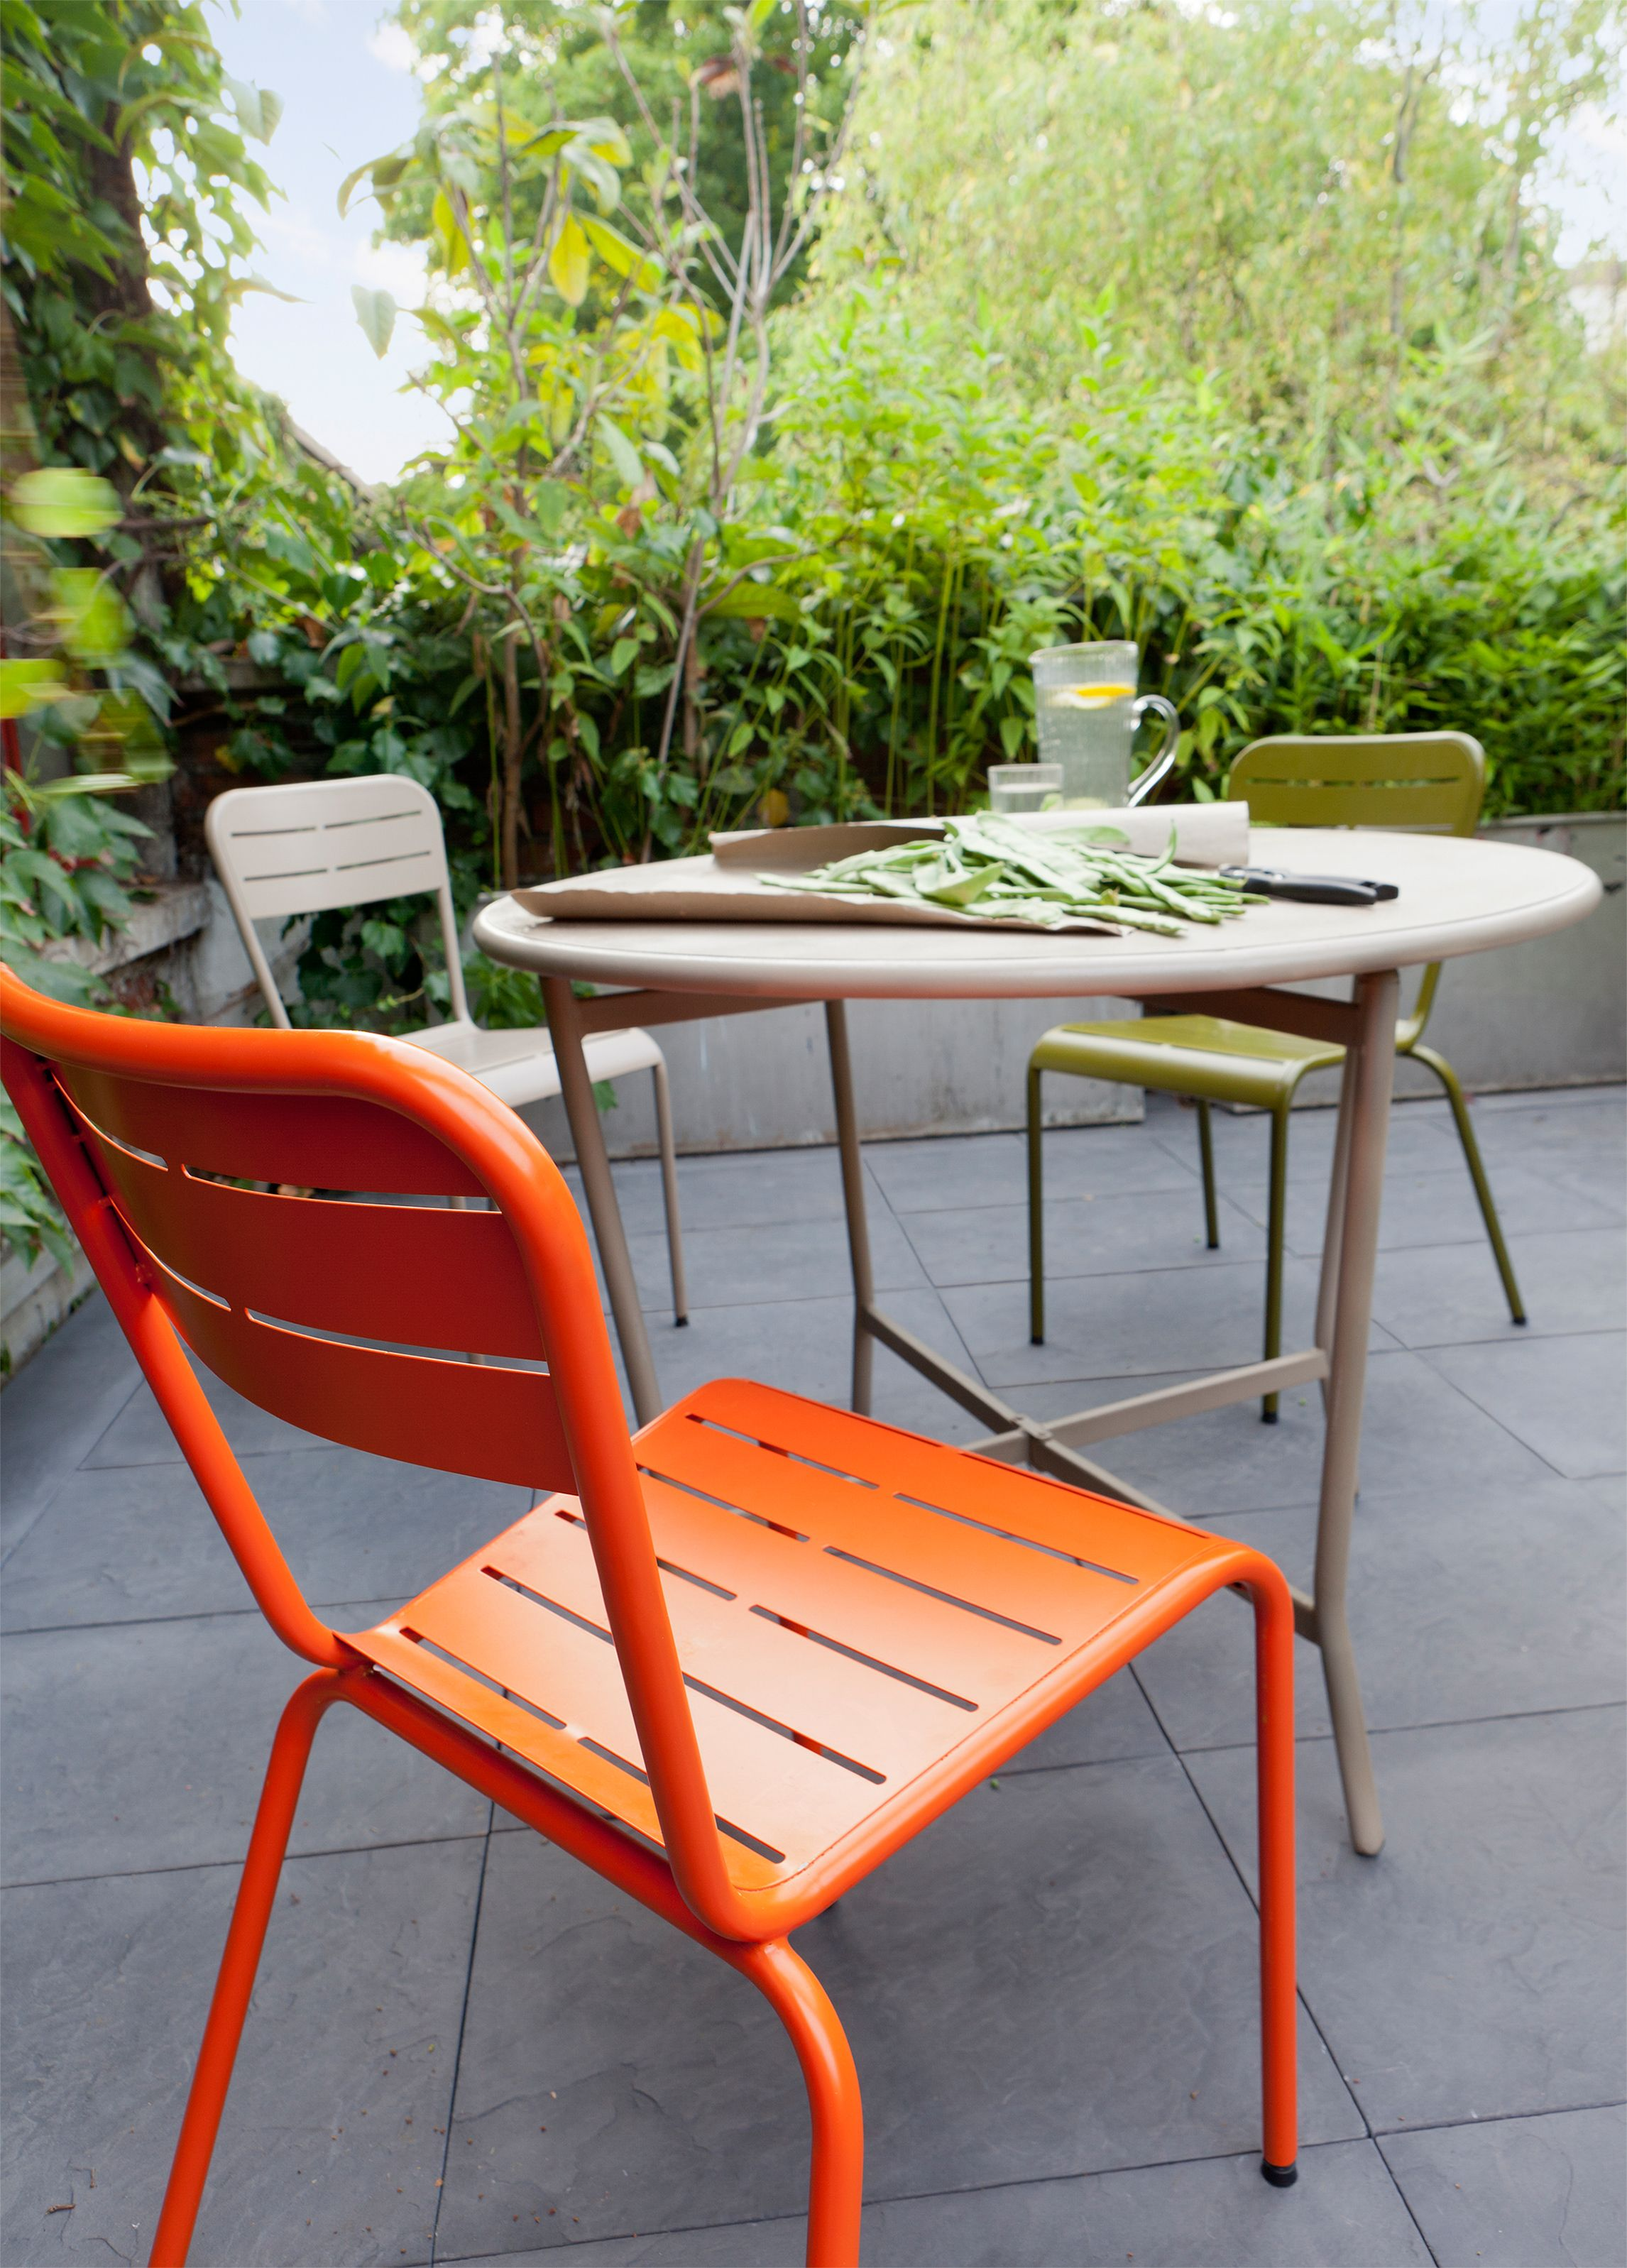 Mobilier BLOOMA Kilby | Castorama, Chaise et Mobilier jardin